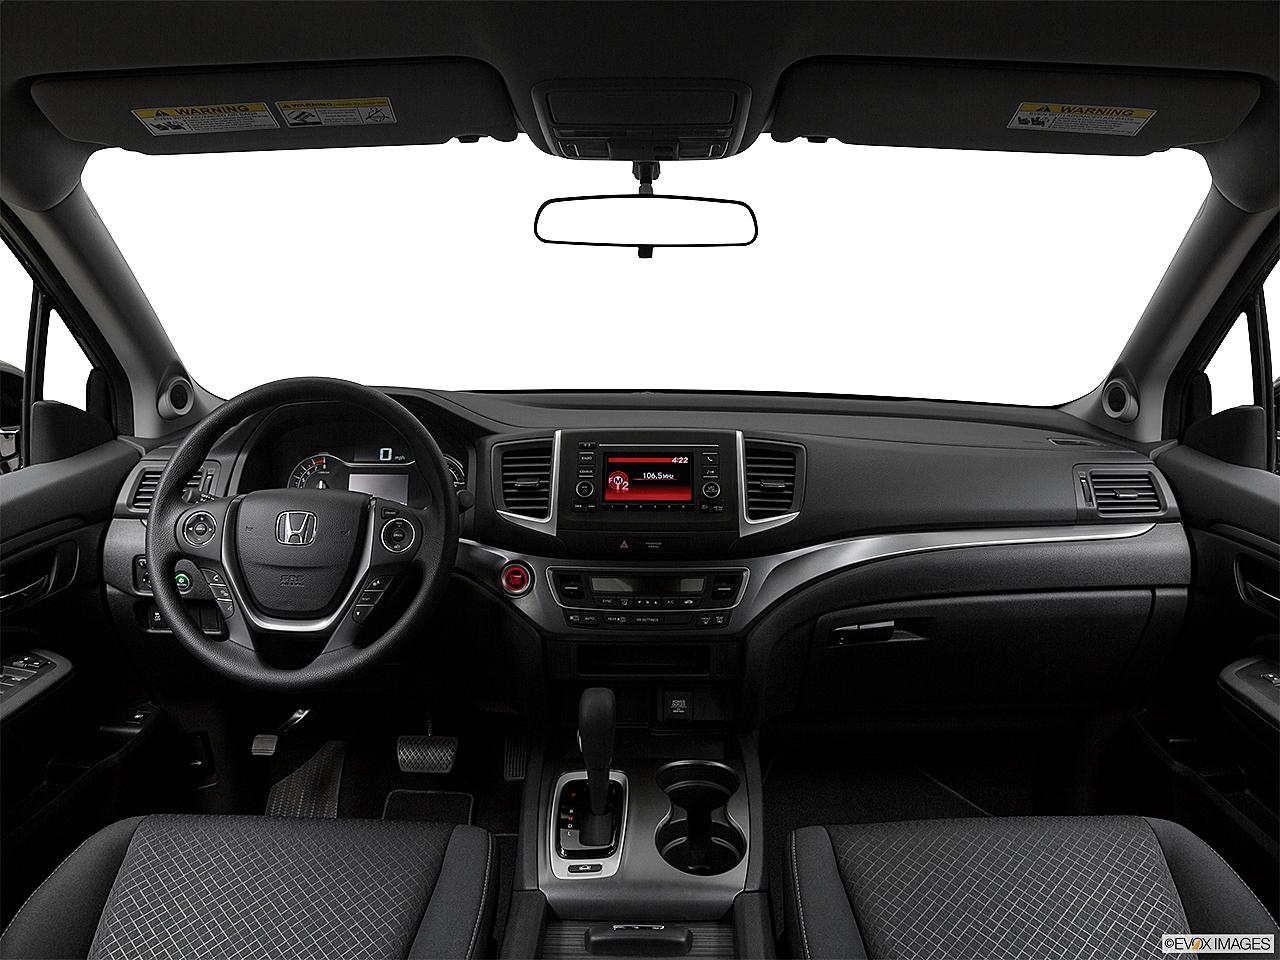 2018 Honda Ridgeline Rt 4dr Crew Cab 5 3 Ft Sb Research Groovecar